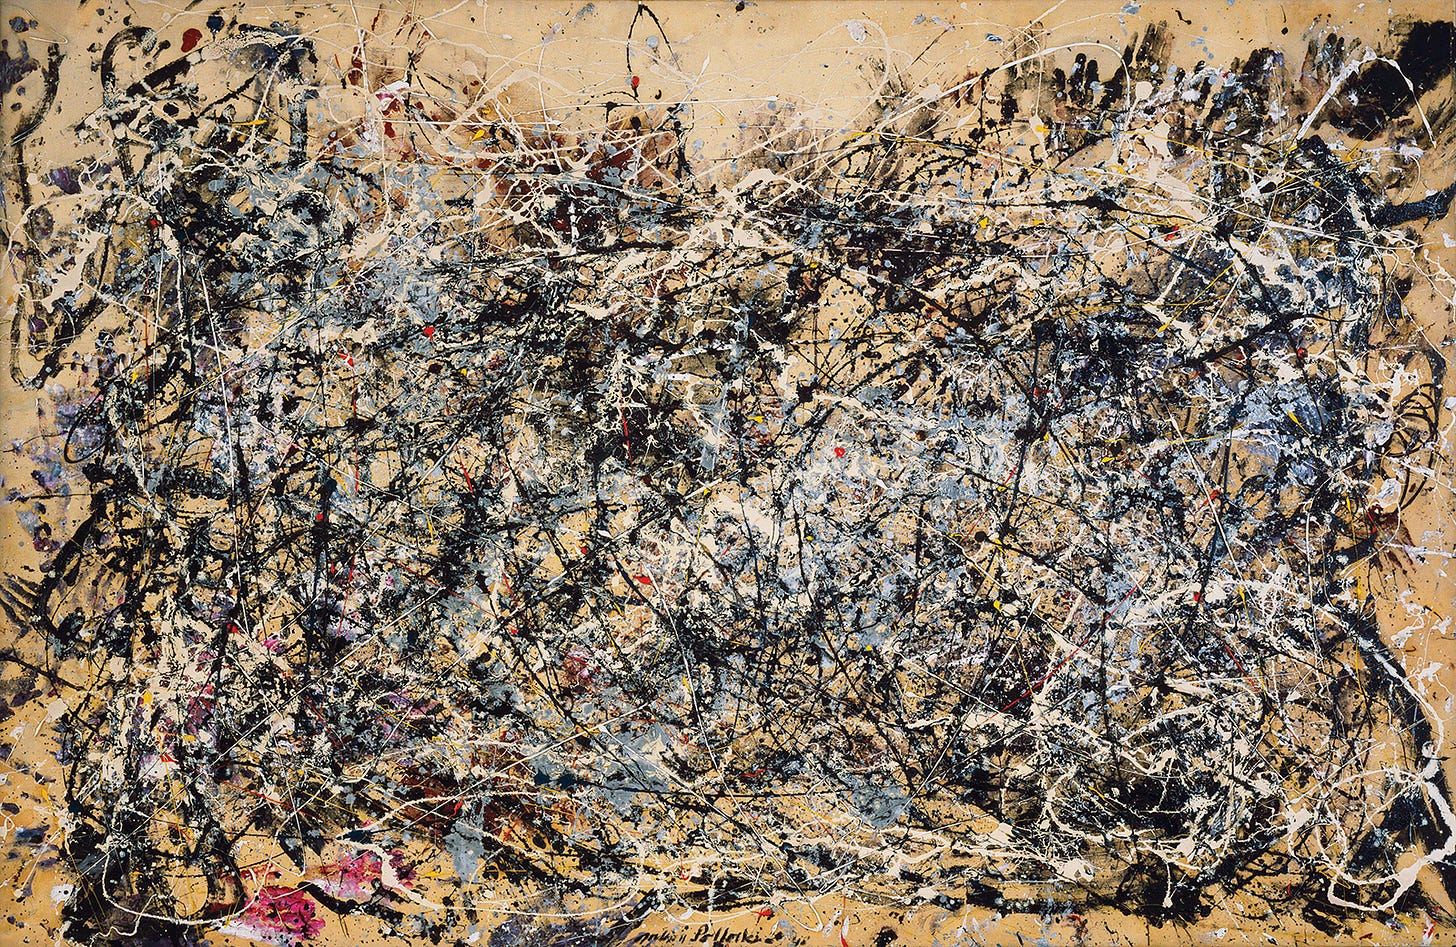 Jackson Pollock | Biography, Art, Paintings, Death, & Facts | Britannica